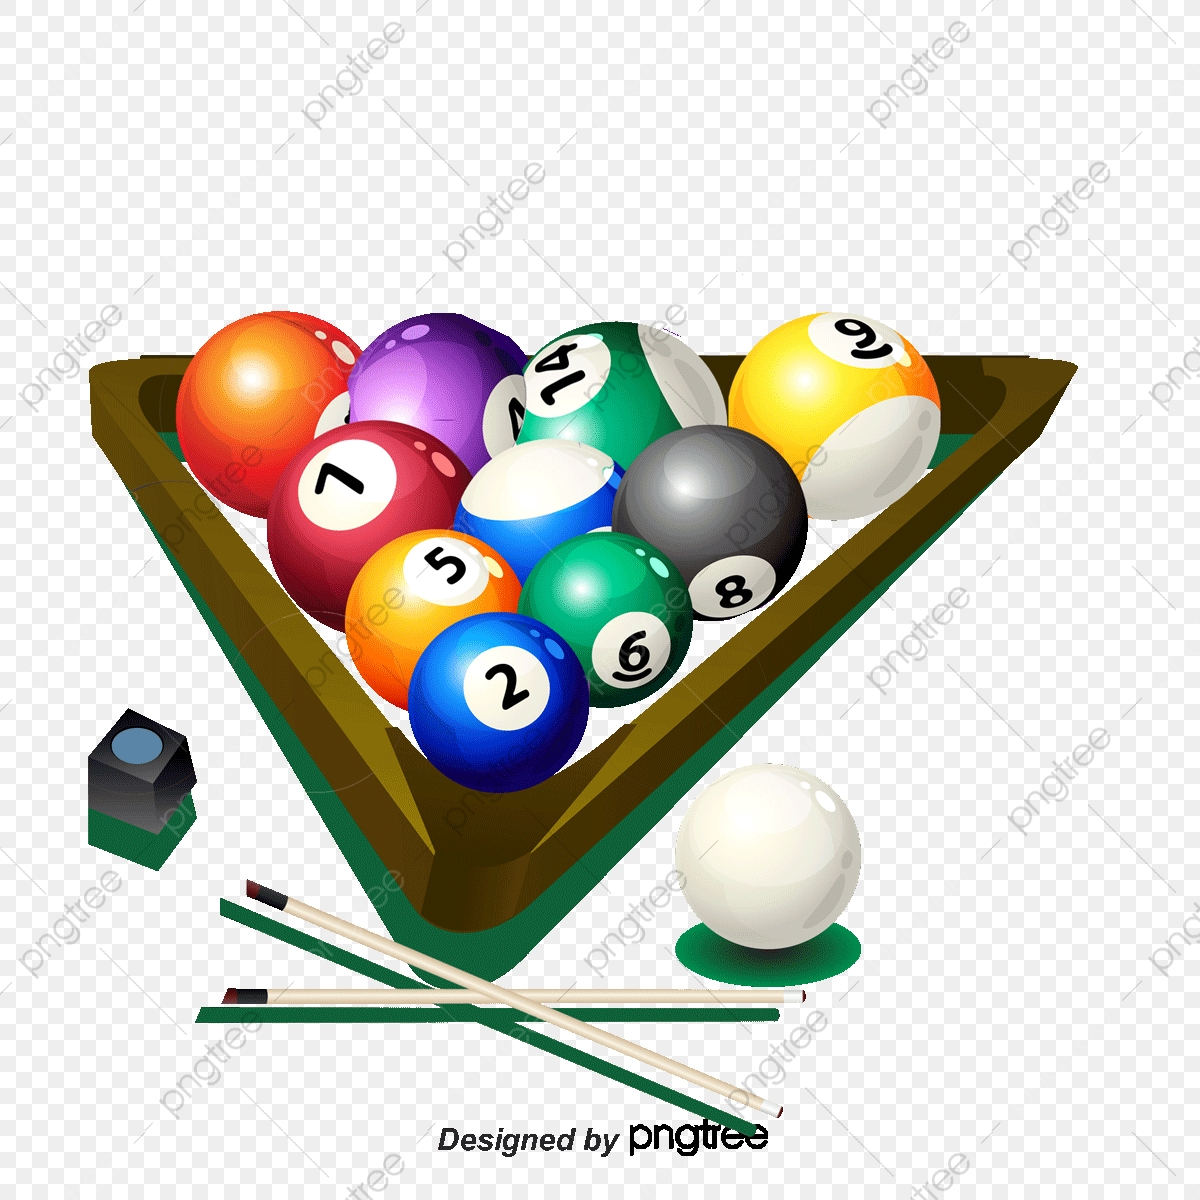 Vector Billiards And Club, Billiards, Cue, Vector Billiards PNG and.